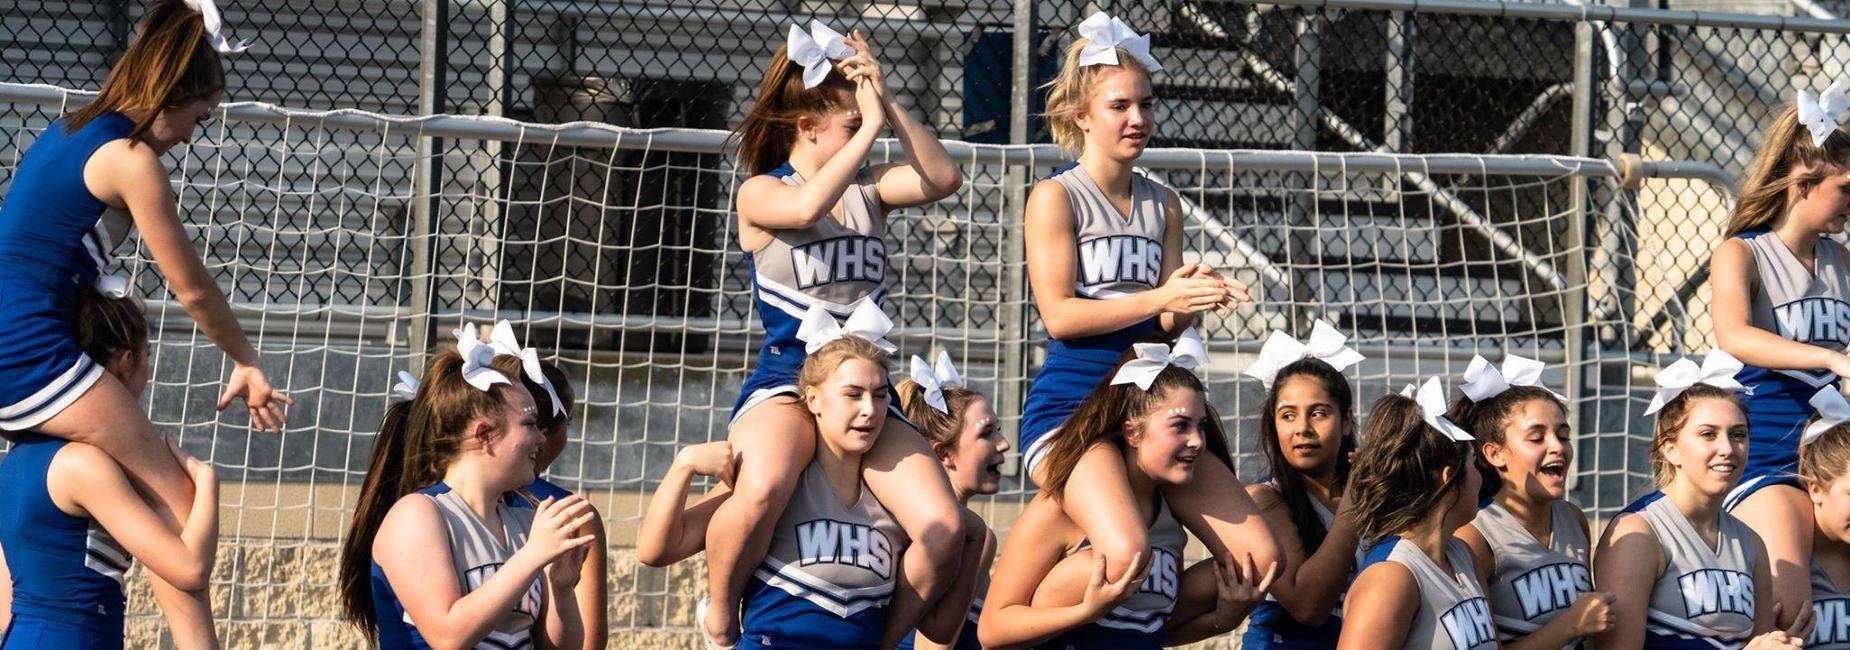 Freshman cheerleaders at a football game